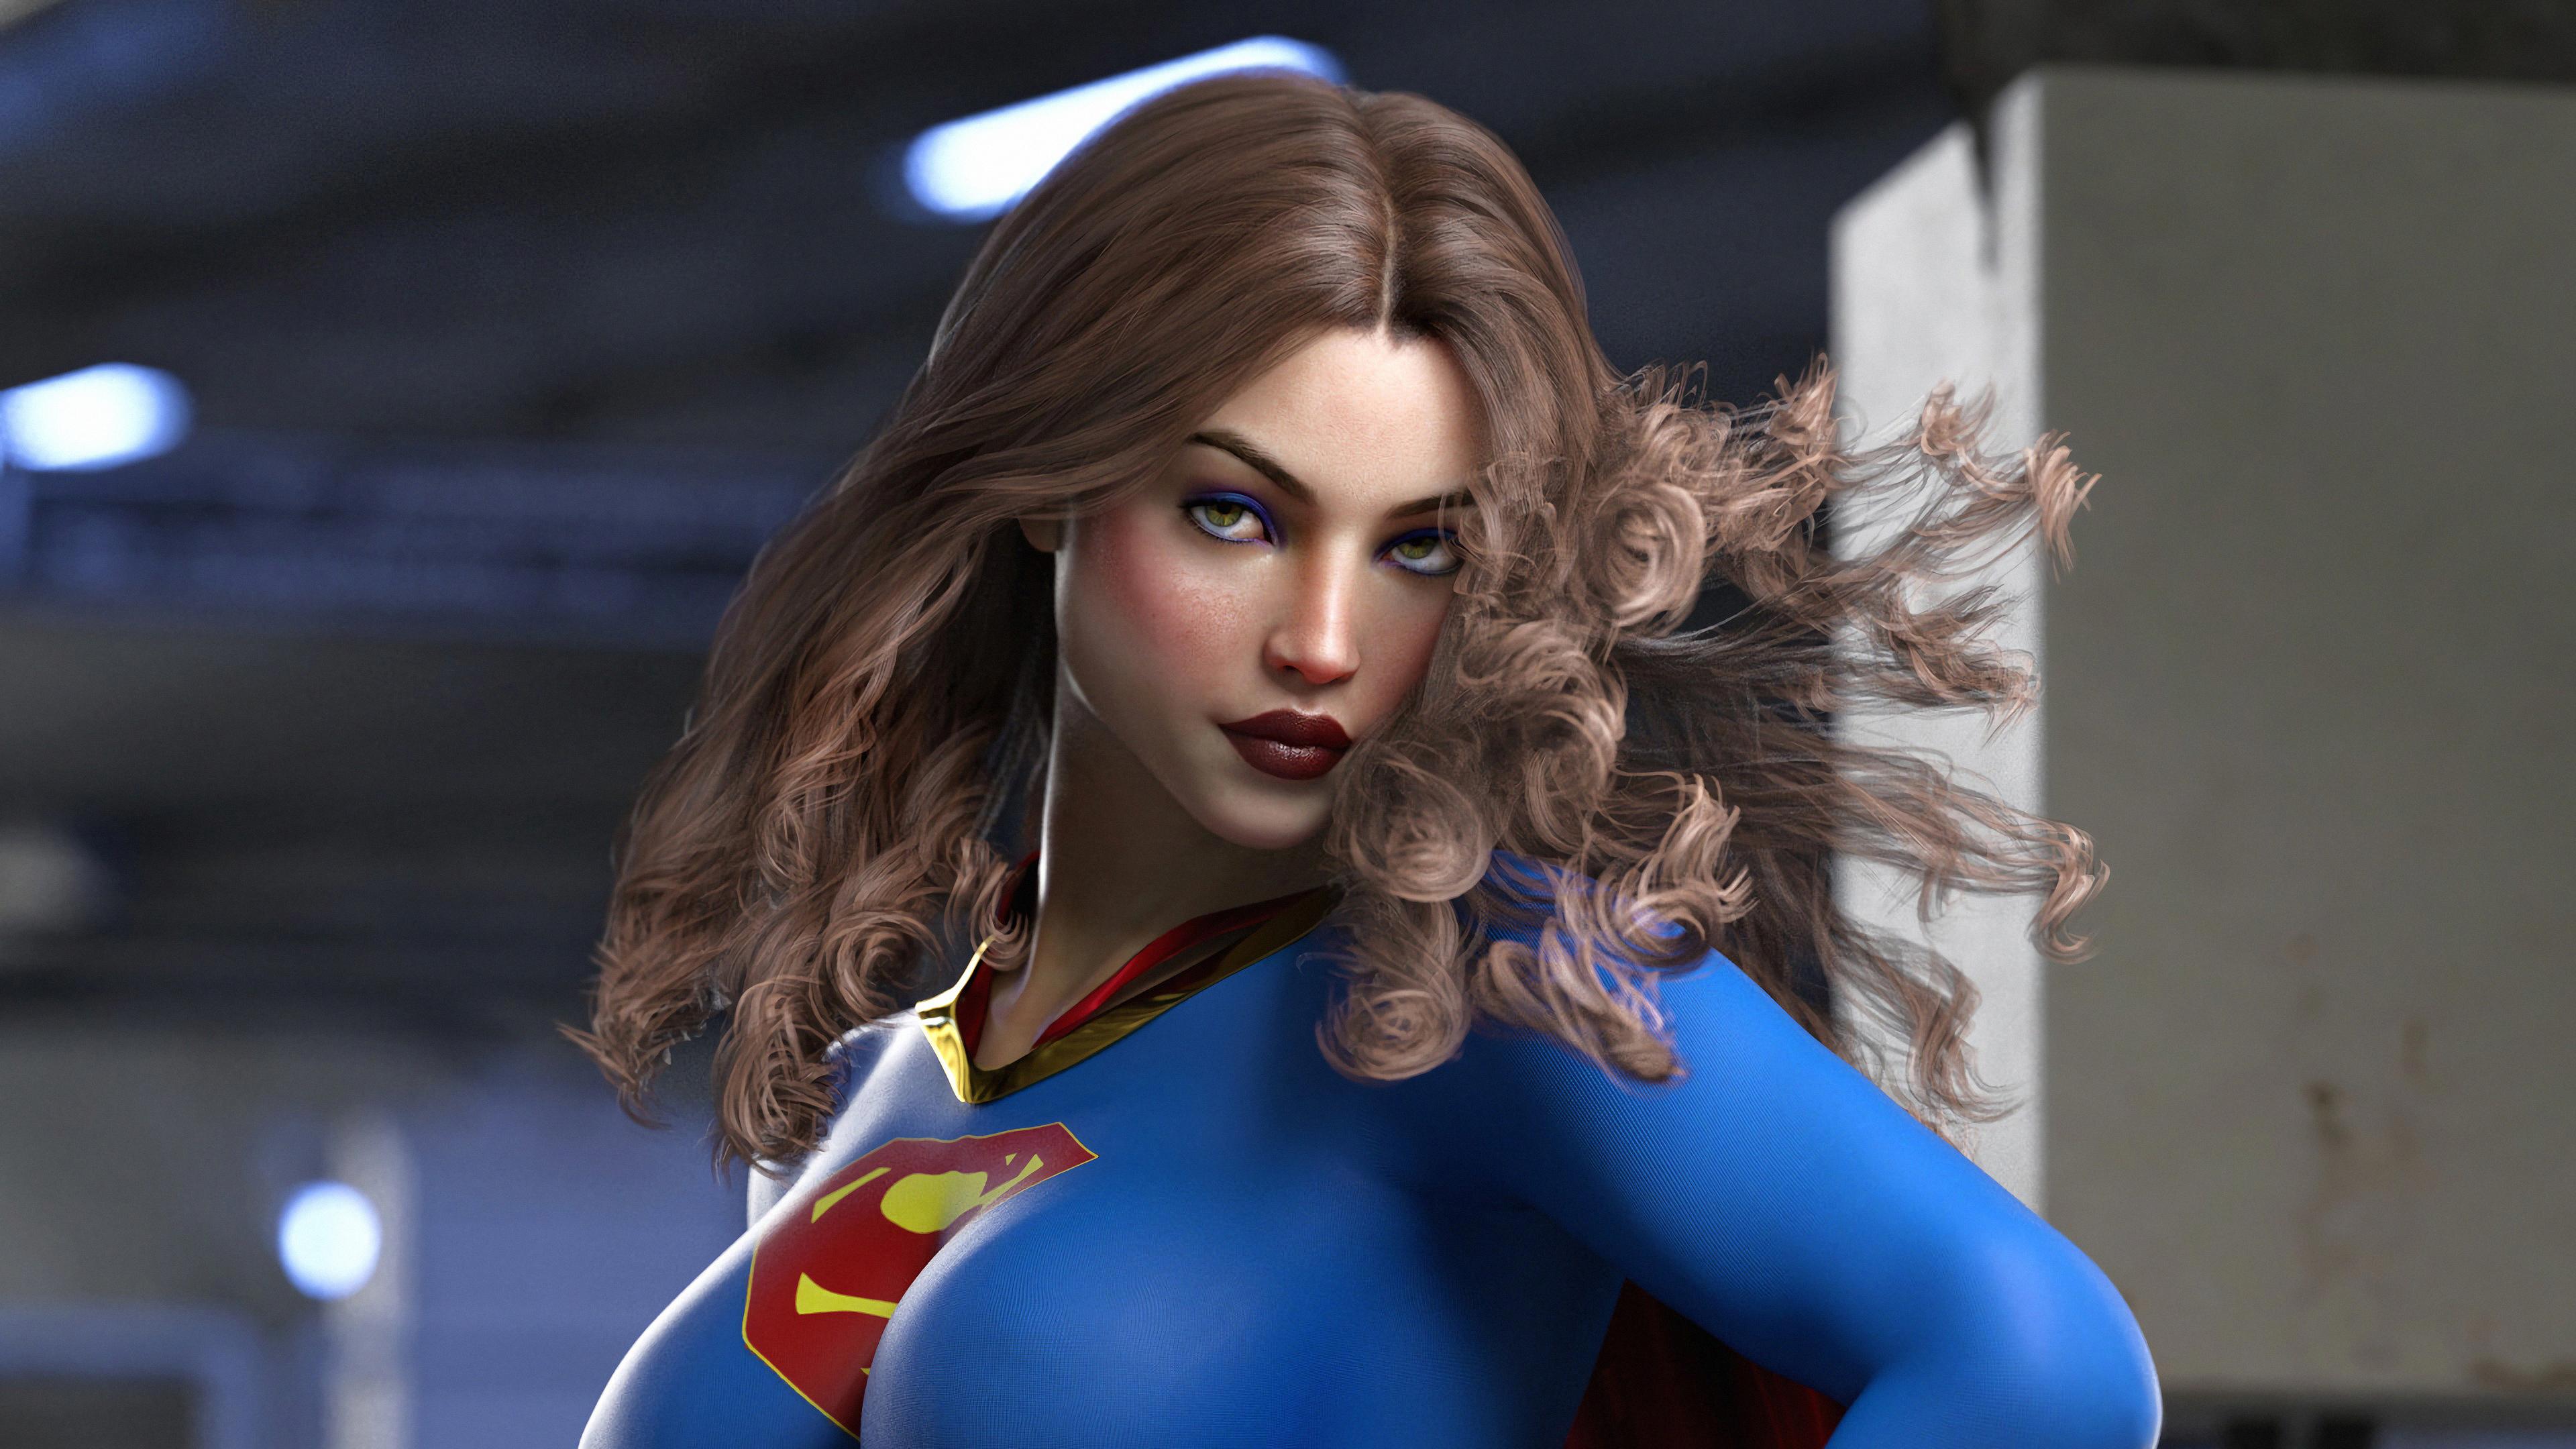 supergirl digital arts 1569186765 - Supergirl Digital Arts - superheroes wallpapers, supergirl wallpapers, hd-wallpapers, digital art wallpapers, artwork wallpapers, artstation wallpapers, 4k-wallpapers